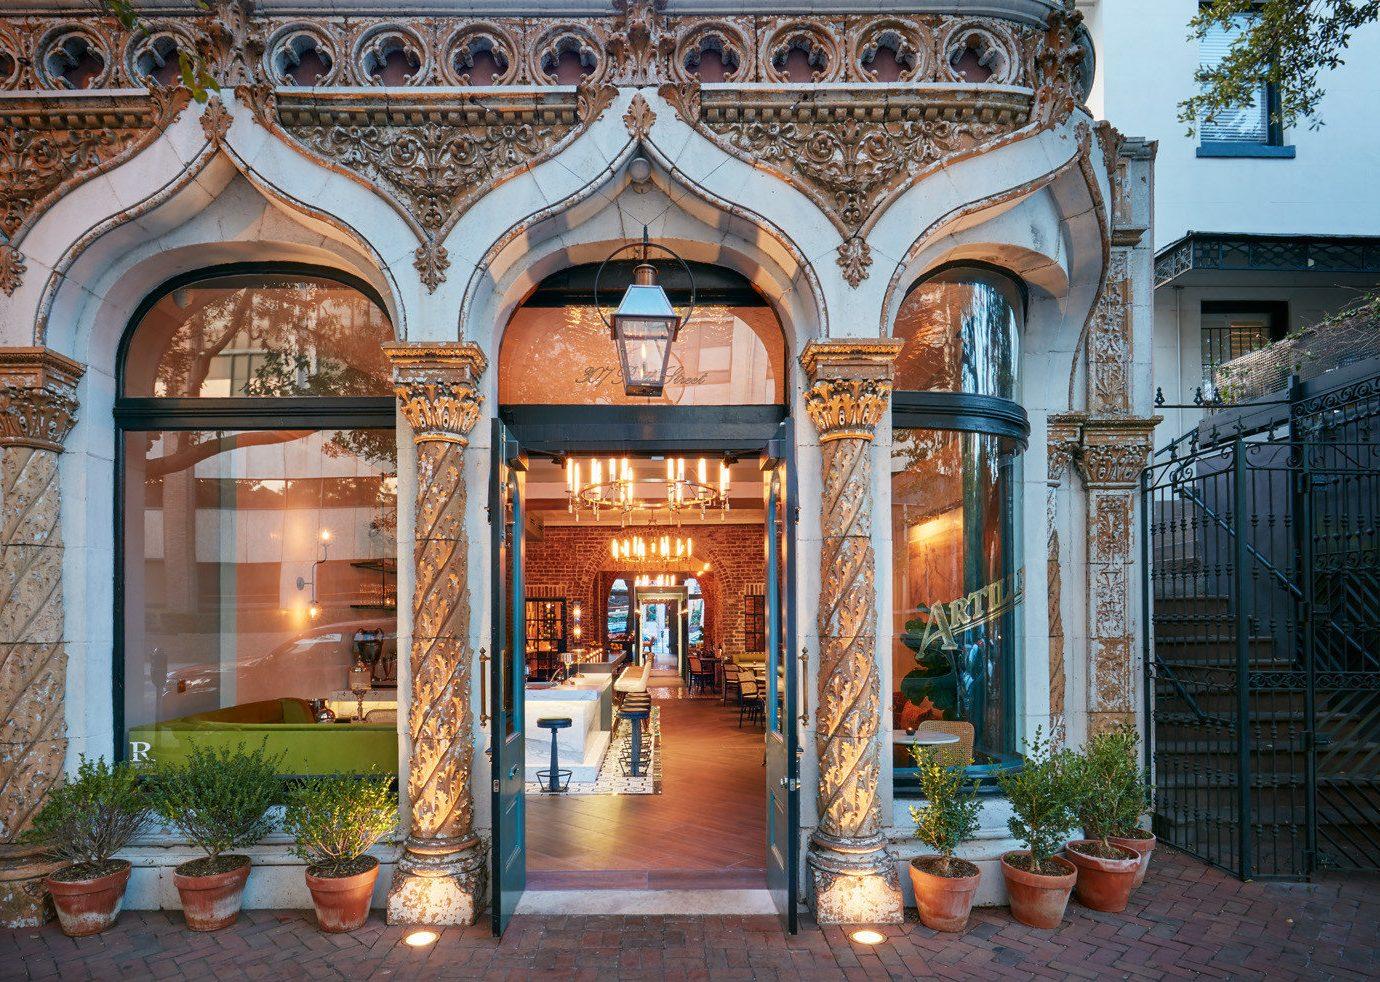 Boutique Hotels Food + Drink Girls Getaways Trip Ideas Weekend Getaways arch facade Courtyard estate real estate building window hacienda